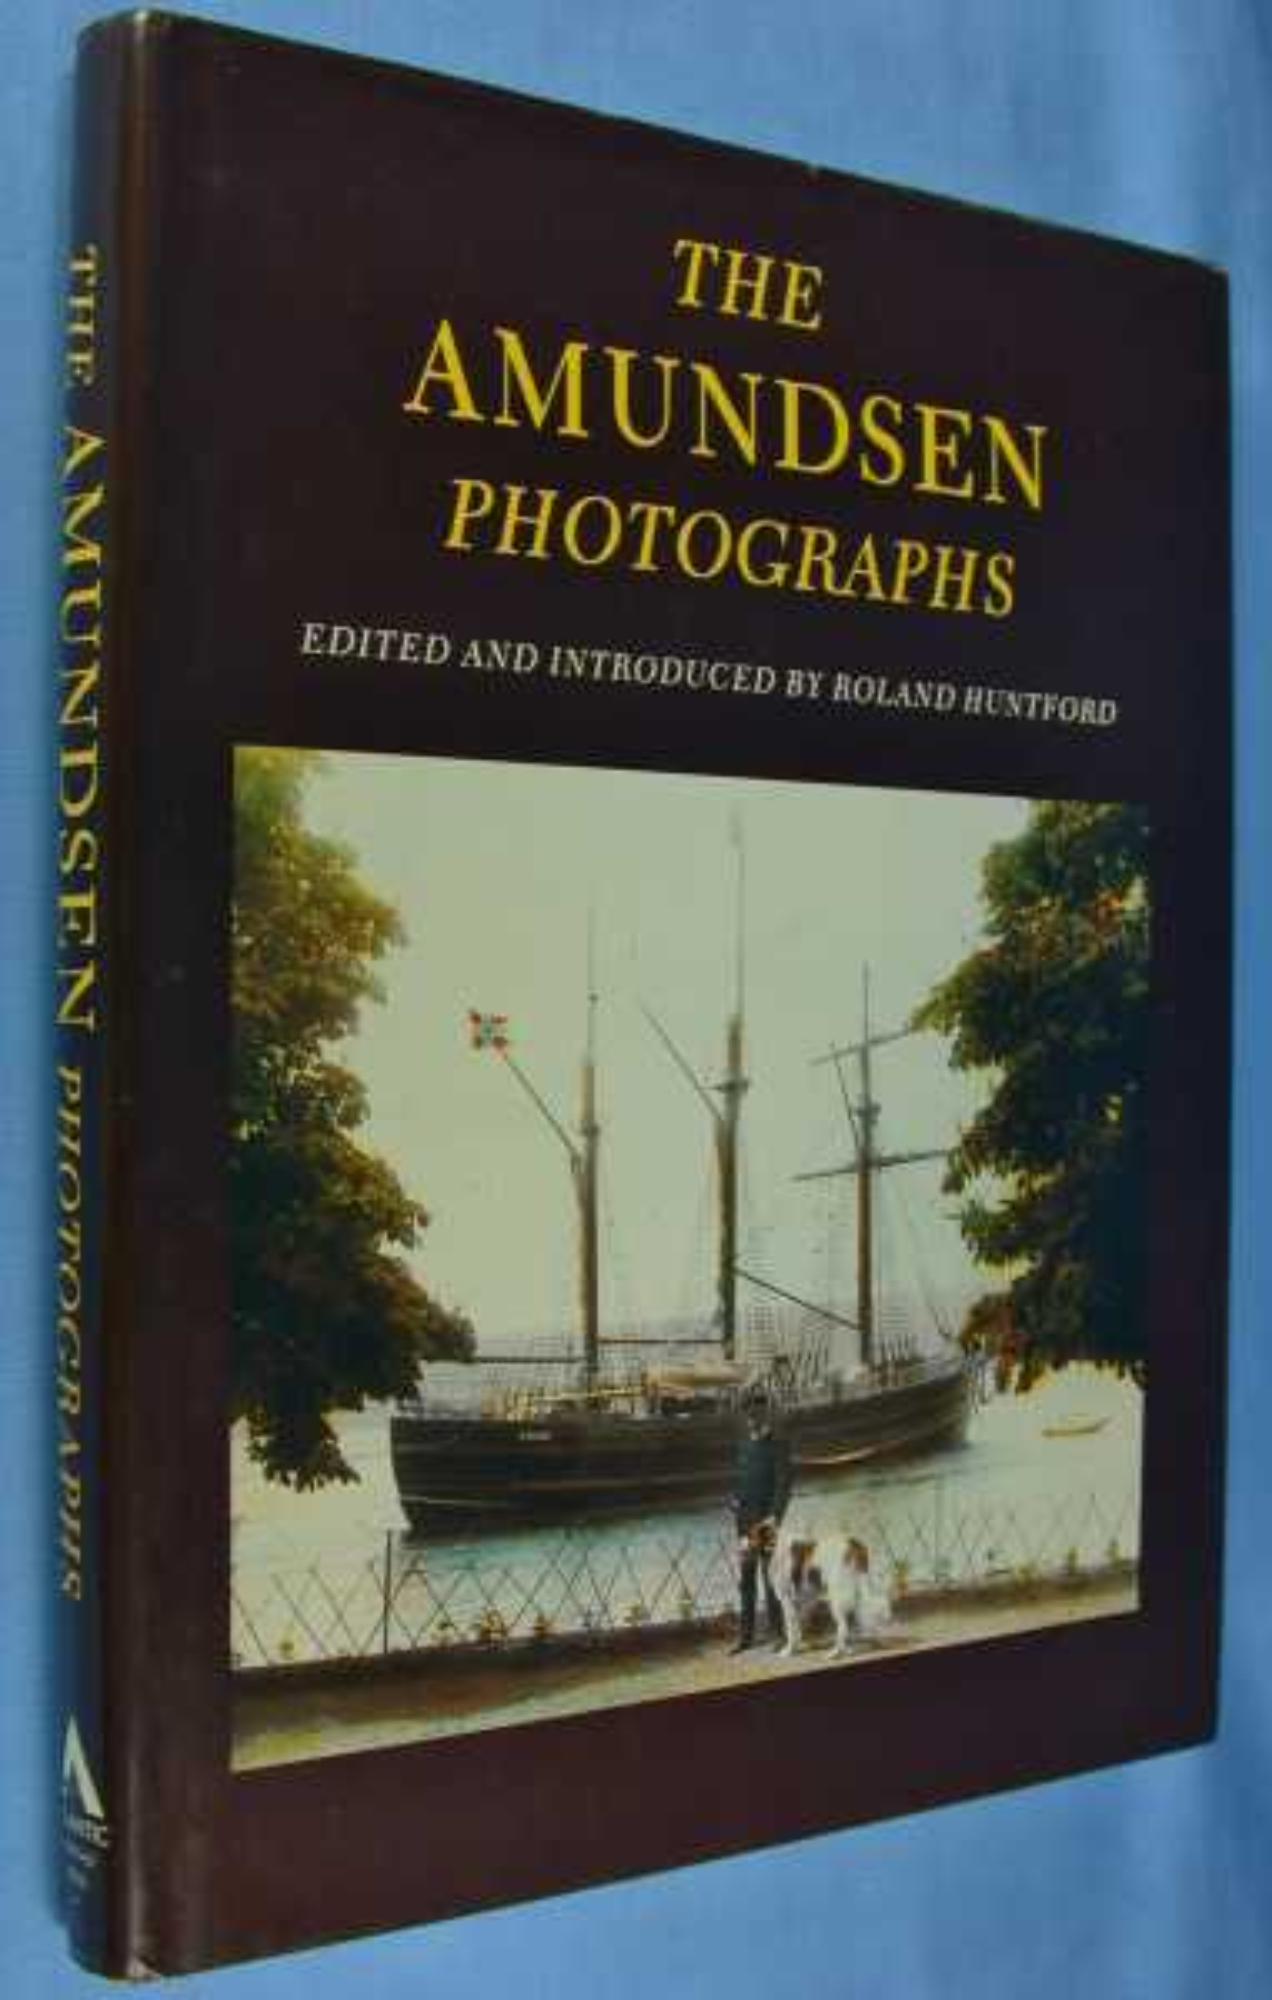 The Amundsen Photographs, Huntford, Roland (editor, introduction)